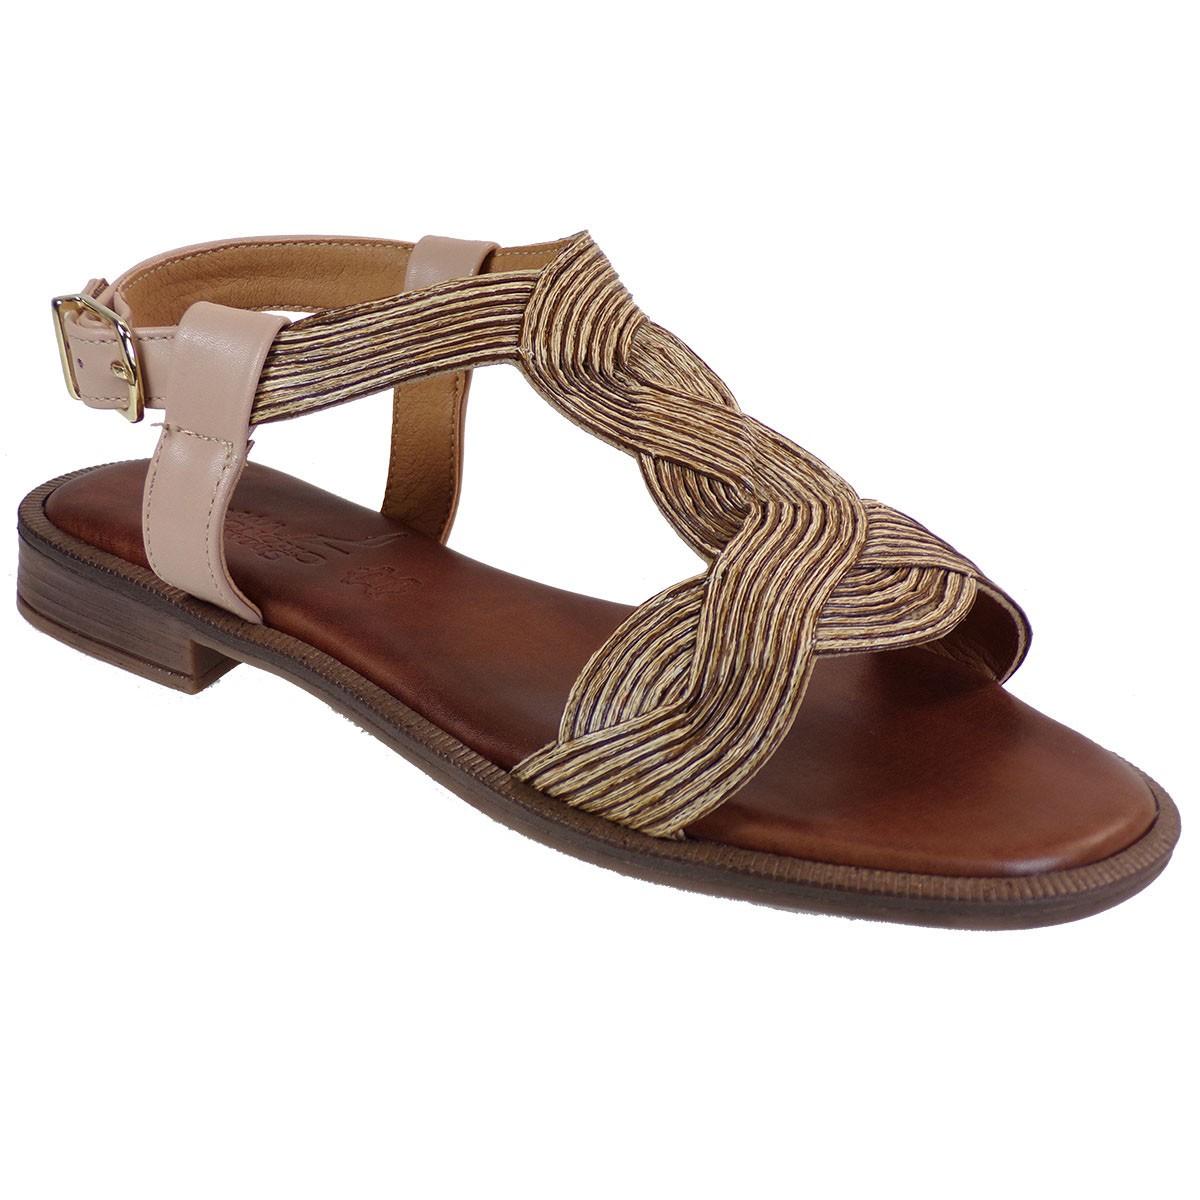 Smart Cronos Γυναικεία Παπούτσια Πέδιλα 7110-1085 Μόκα Μπαμπού